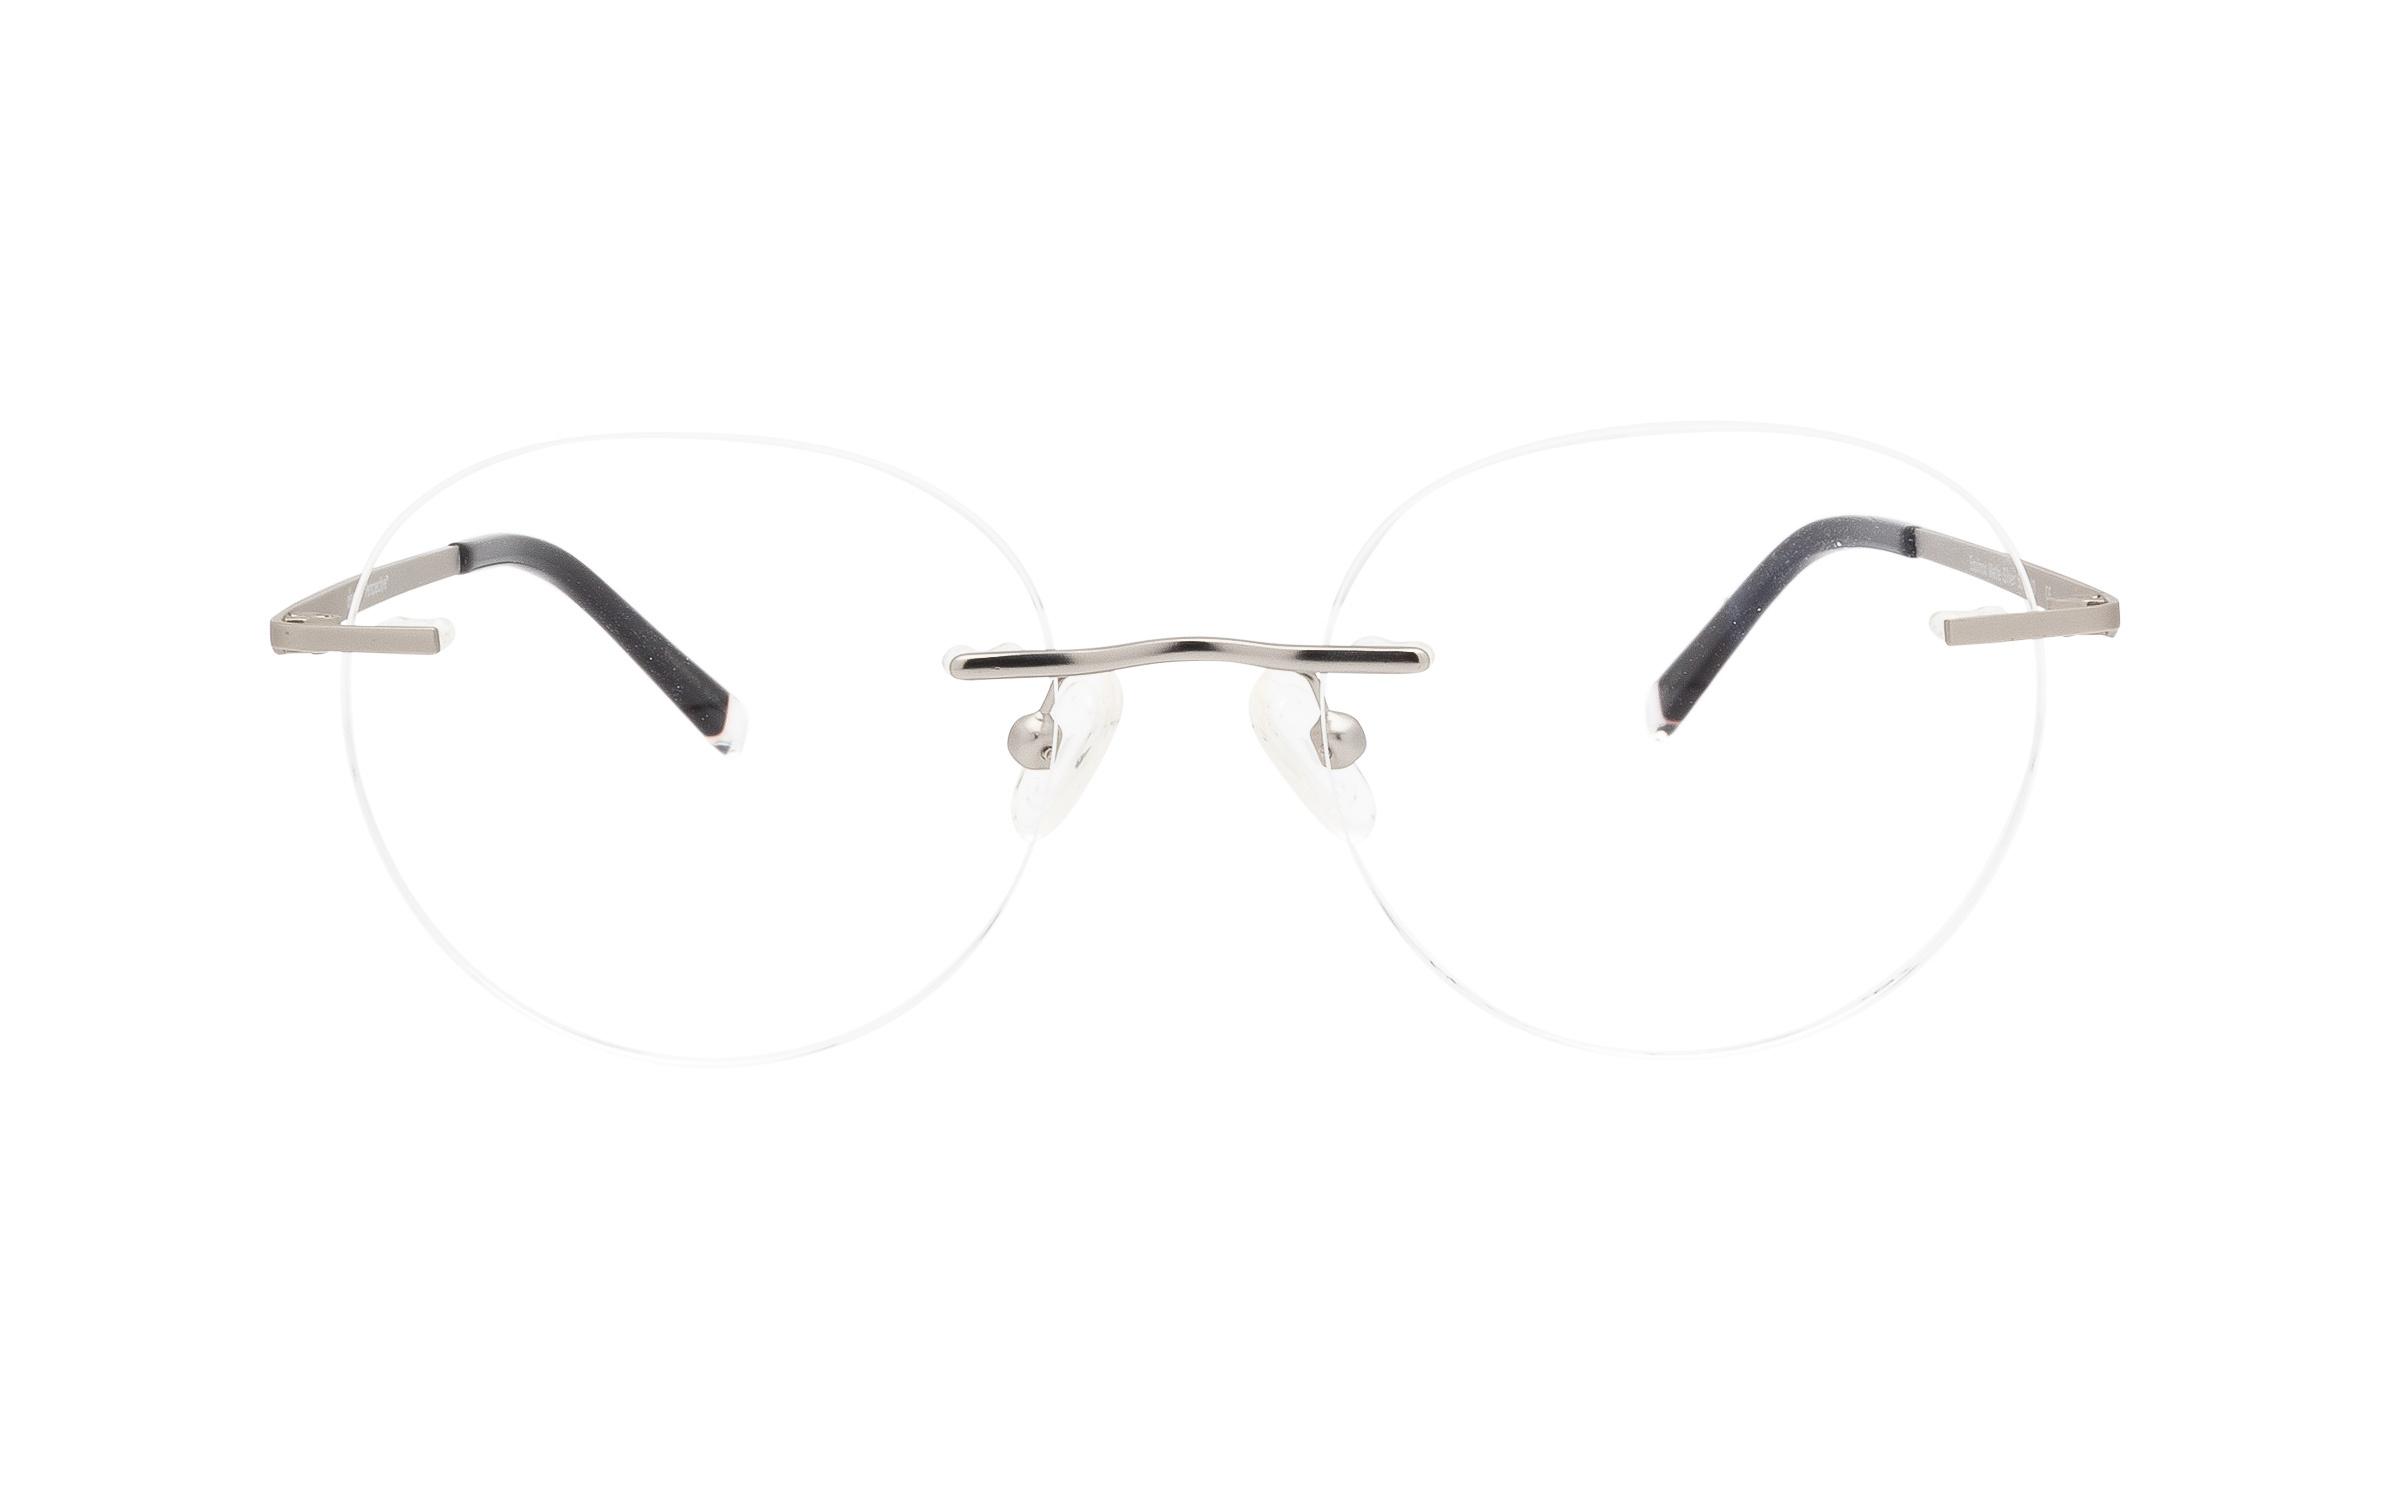 http://www.coastal.com/ - Perspective Equinox PER014 C04 (50) Eyeglasses and Frame in Matte Silver | Metal – Online Coastal